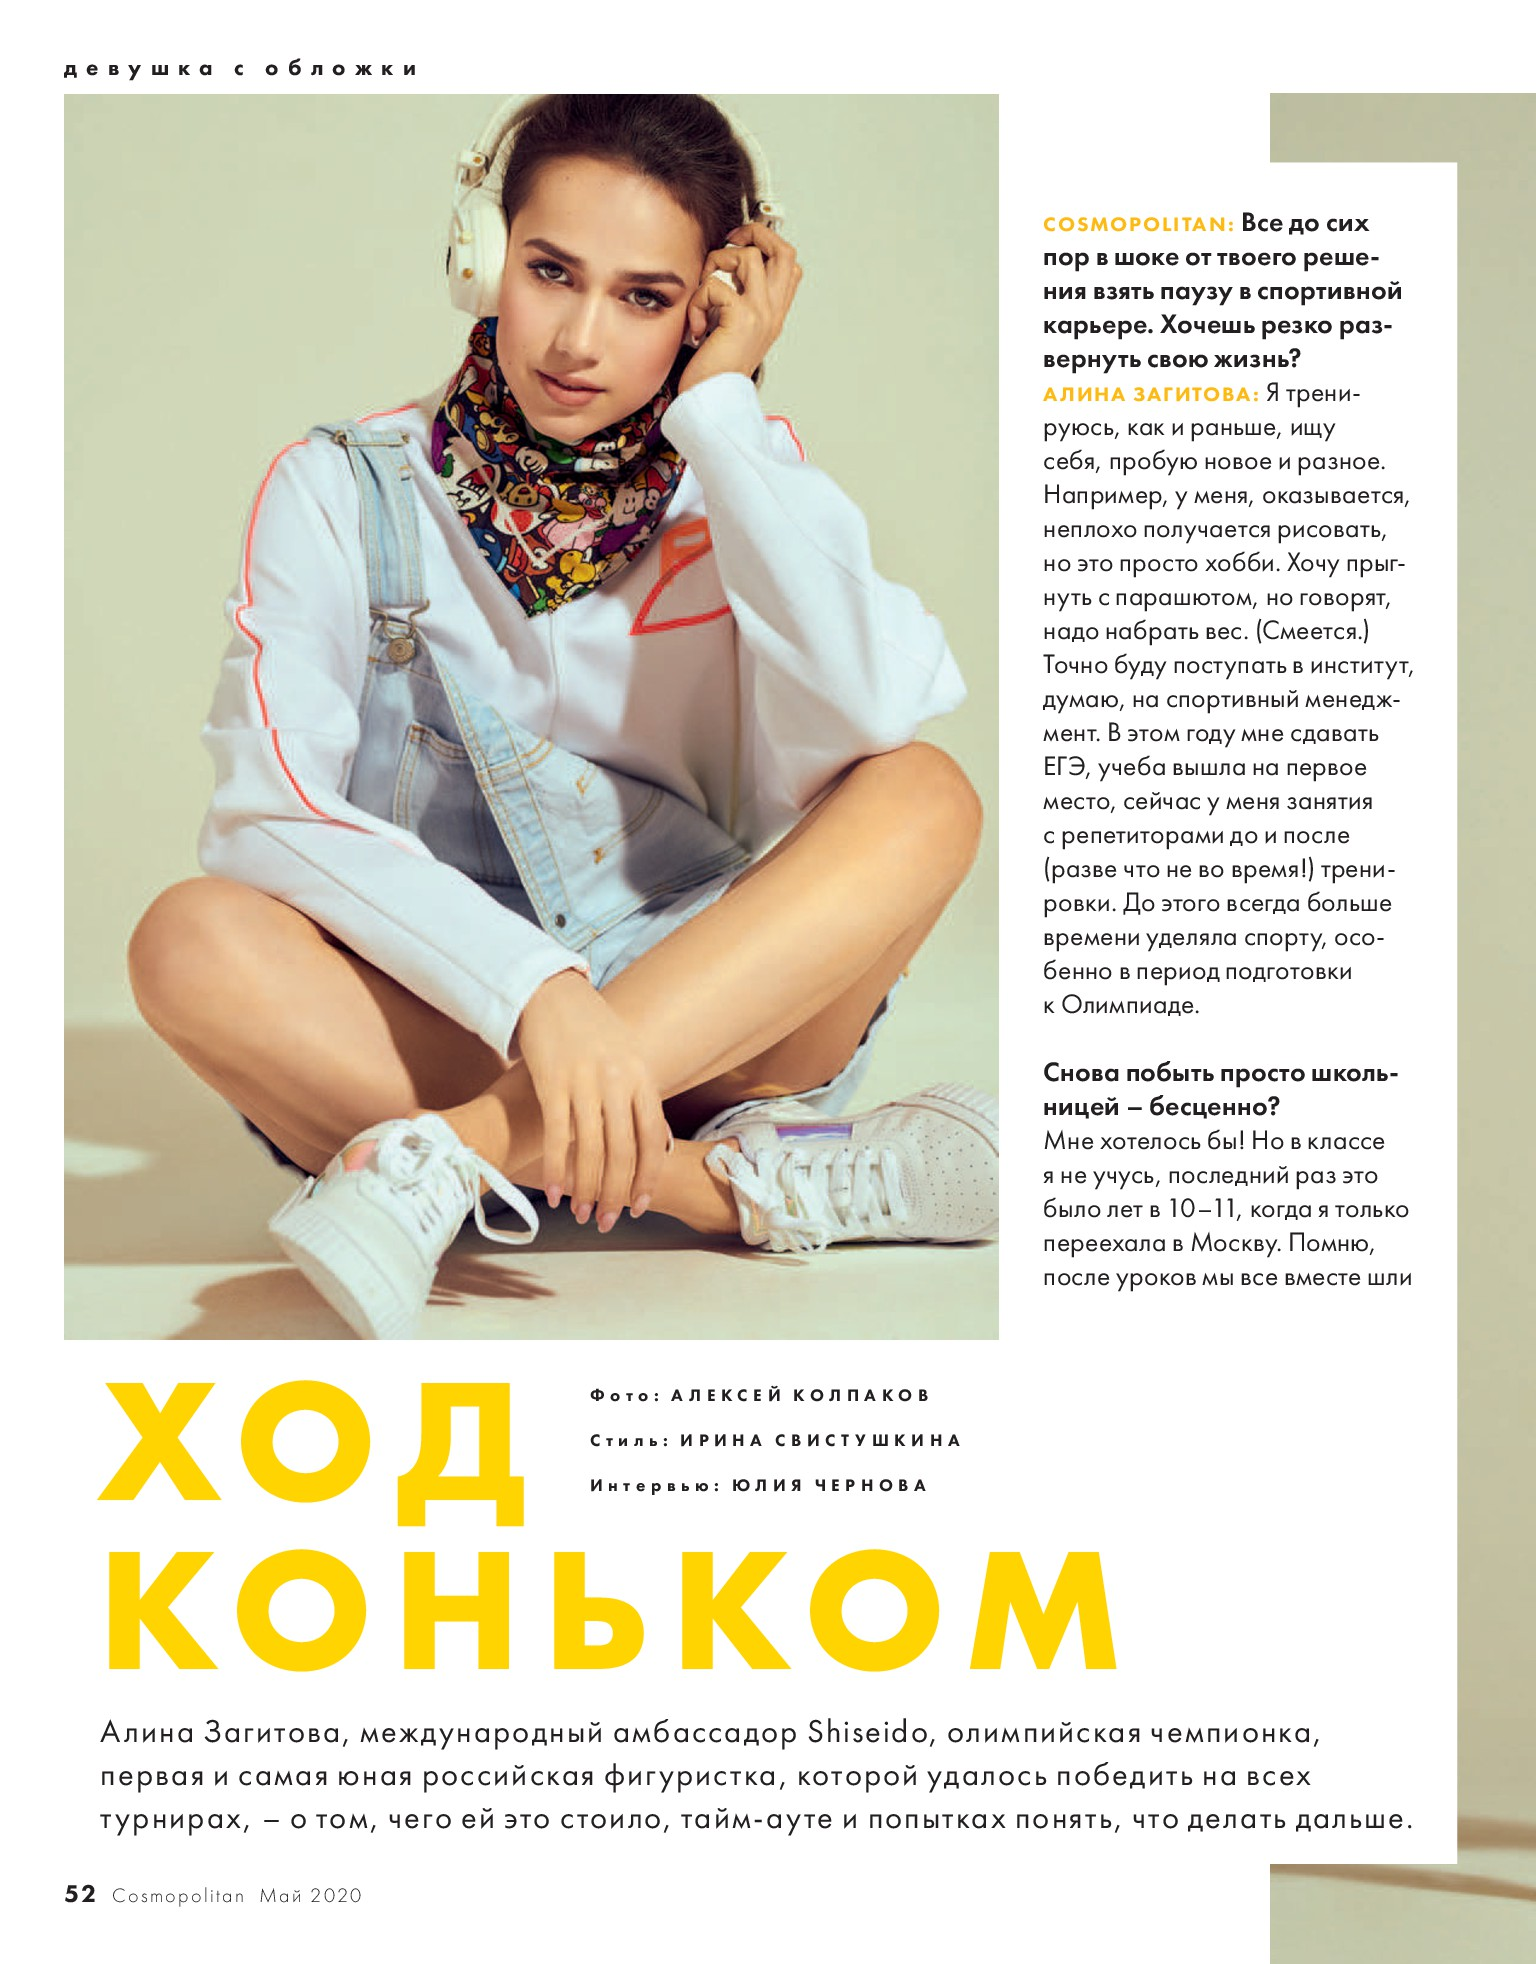 Алина Ильназовна Загитова-3 | Олимпийская чемпионка - Страница 6 PKpskP24StA